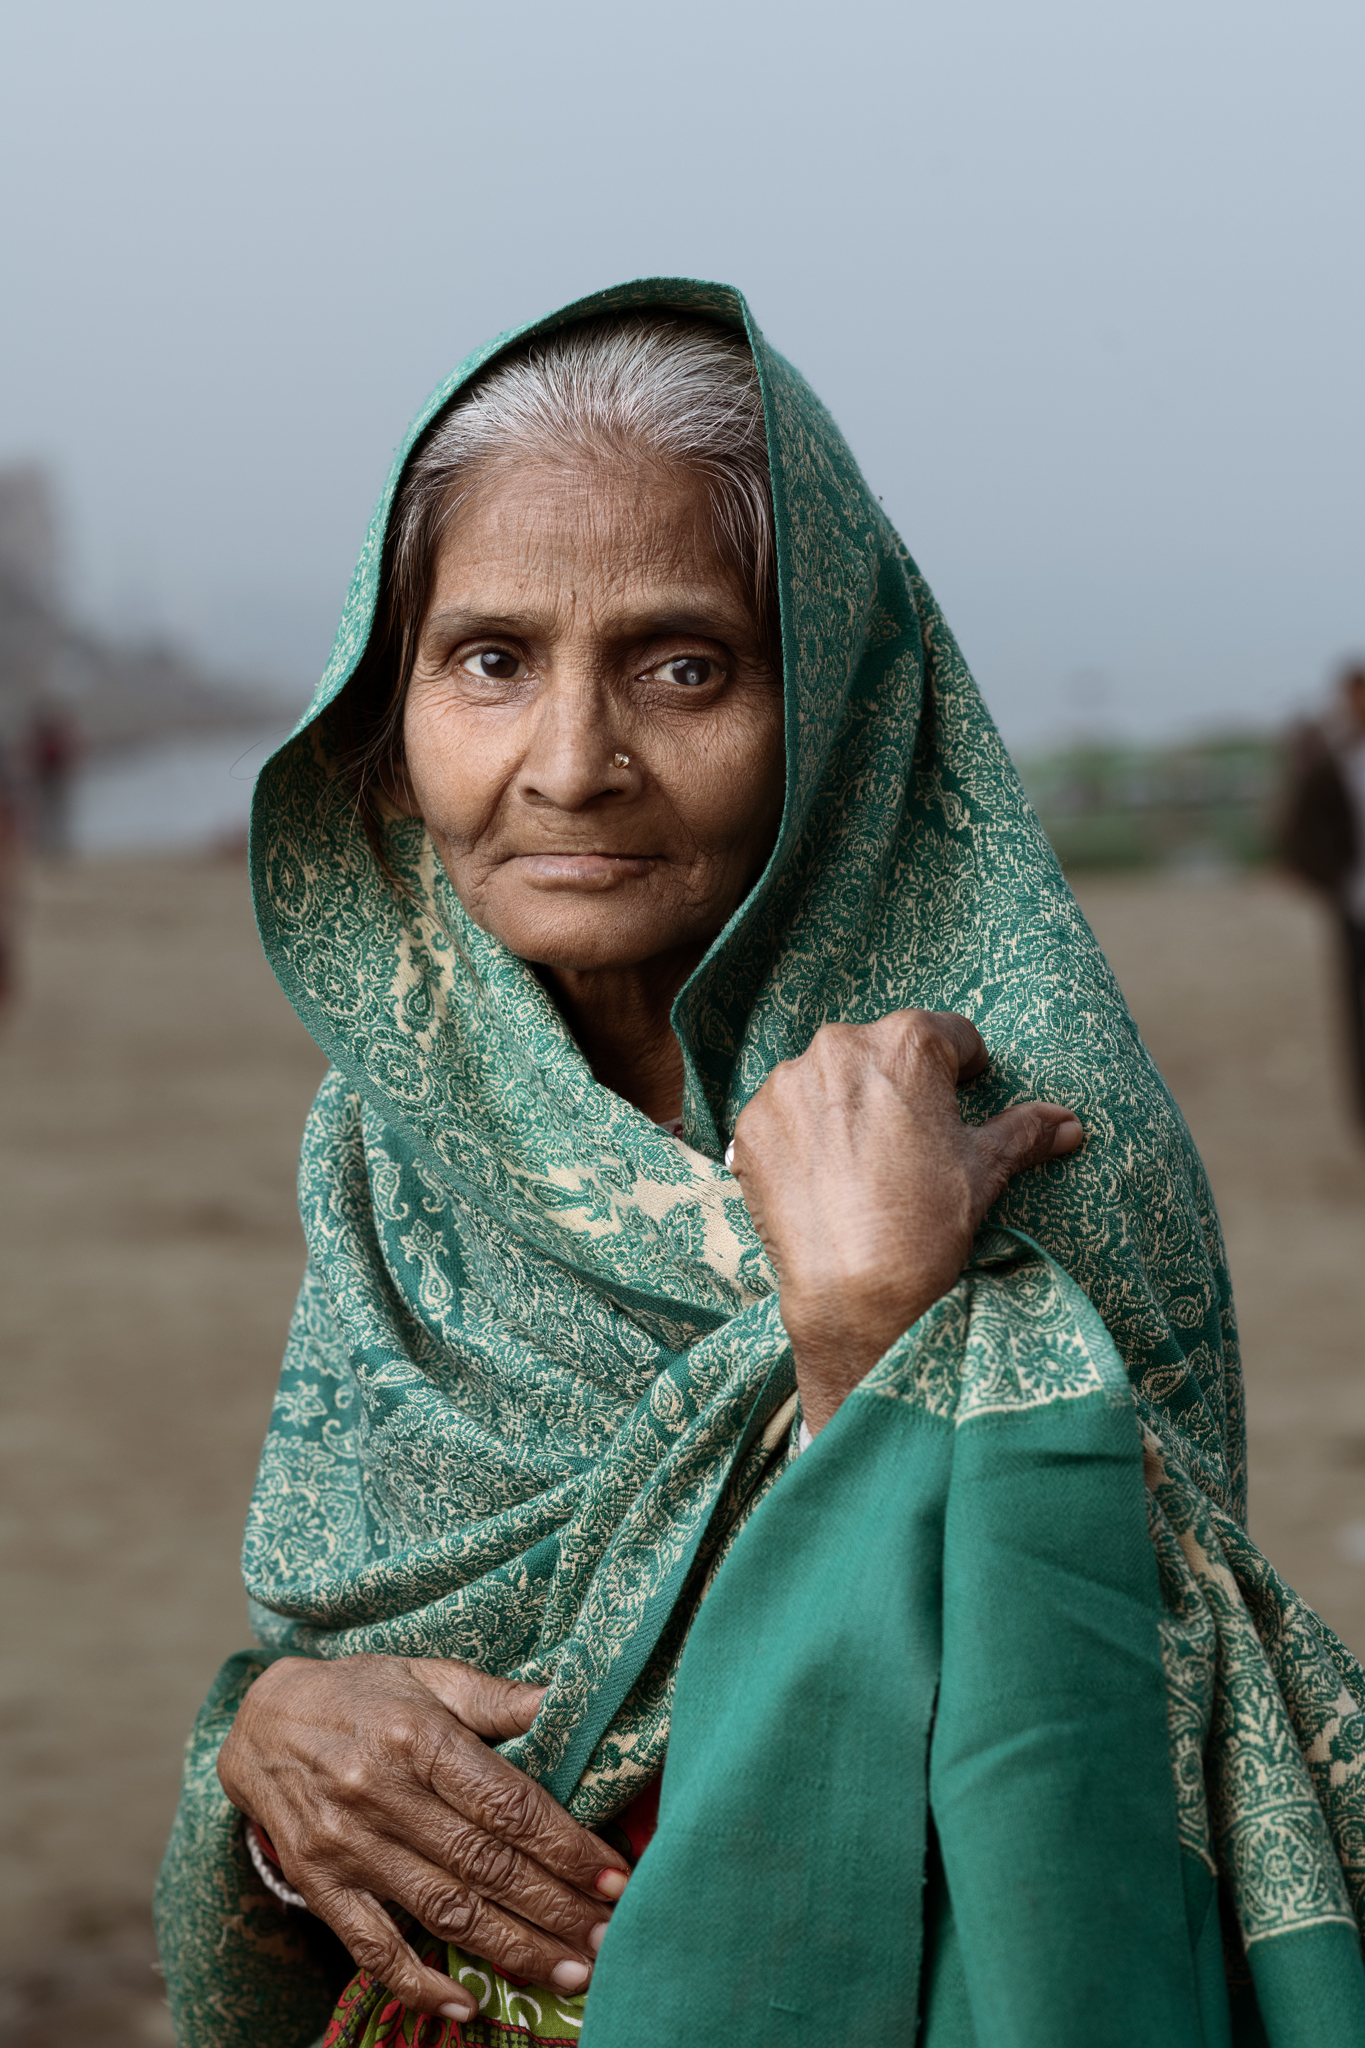 Varanasi_portrait_travel_photography_Manchester_Adventure_Photographer_Jan_Bella40.jpg